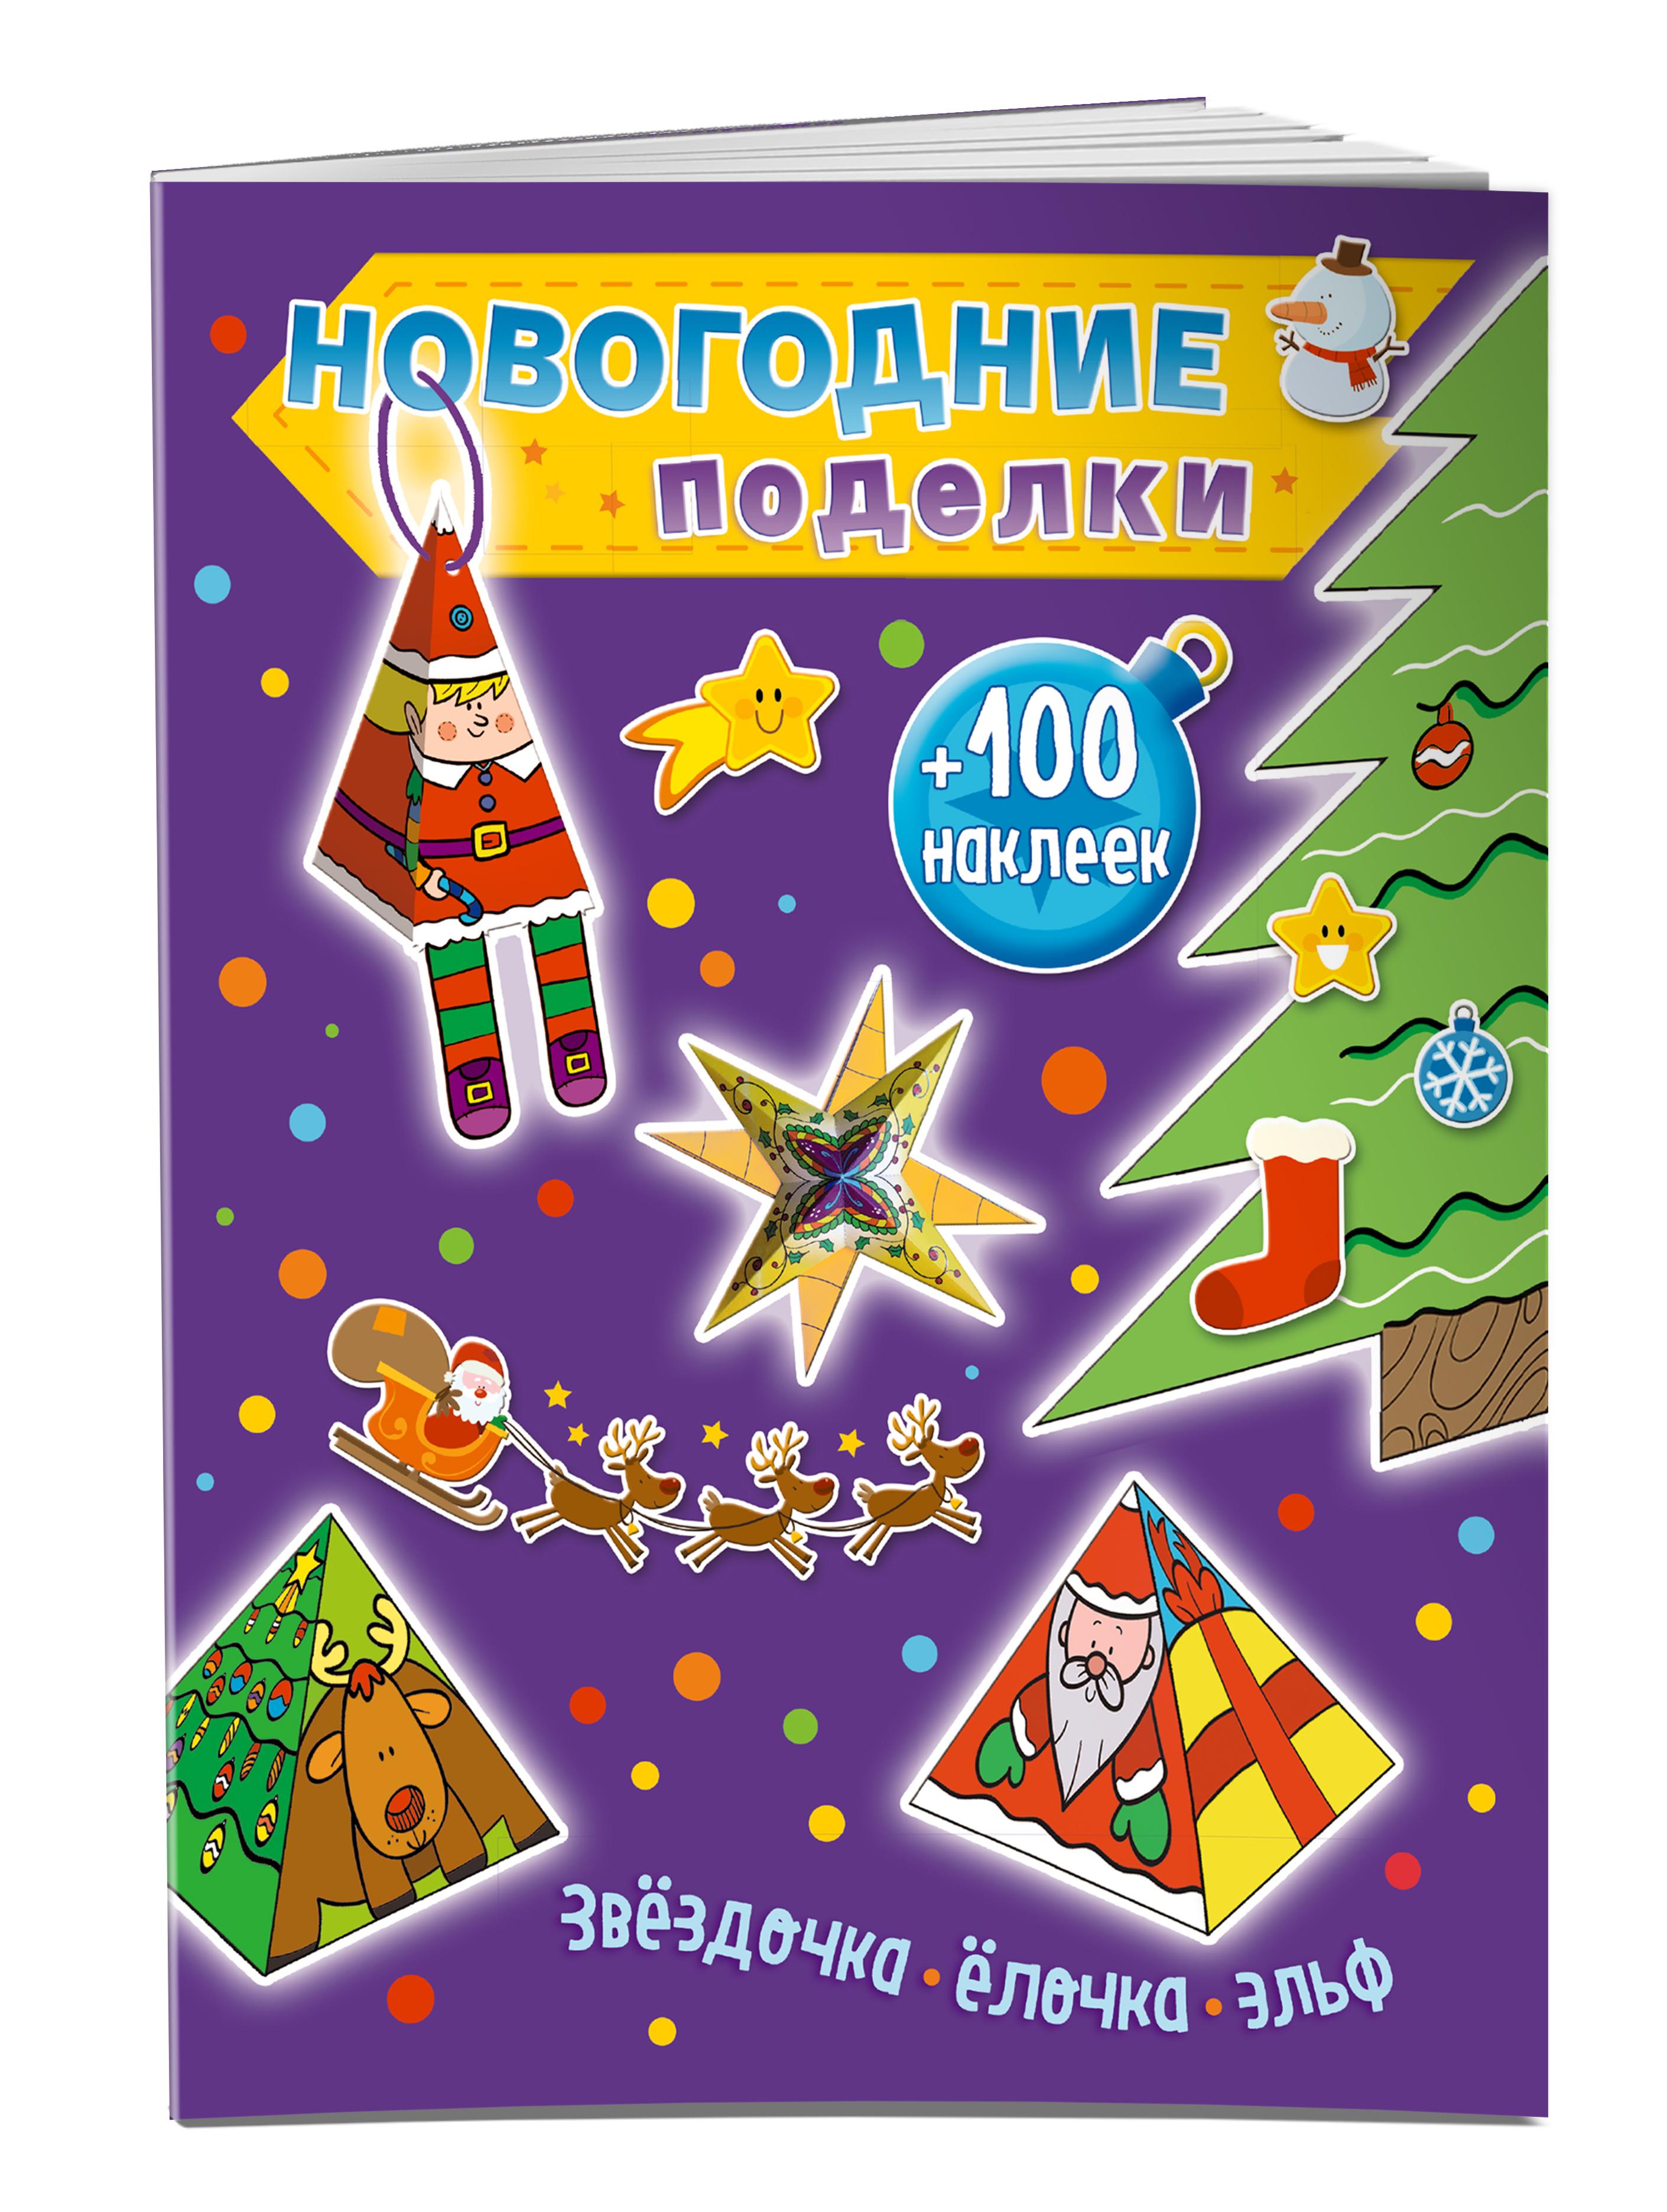 Звездочка, елочка, эльф (+100 наклеек) волченко ю ред новогодние поделки звездочка елочка эльф 100 наклеек